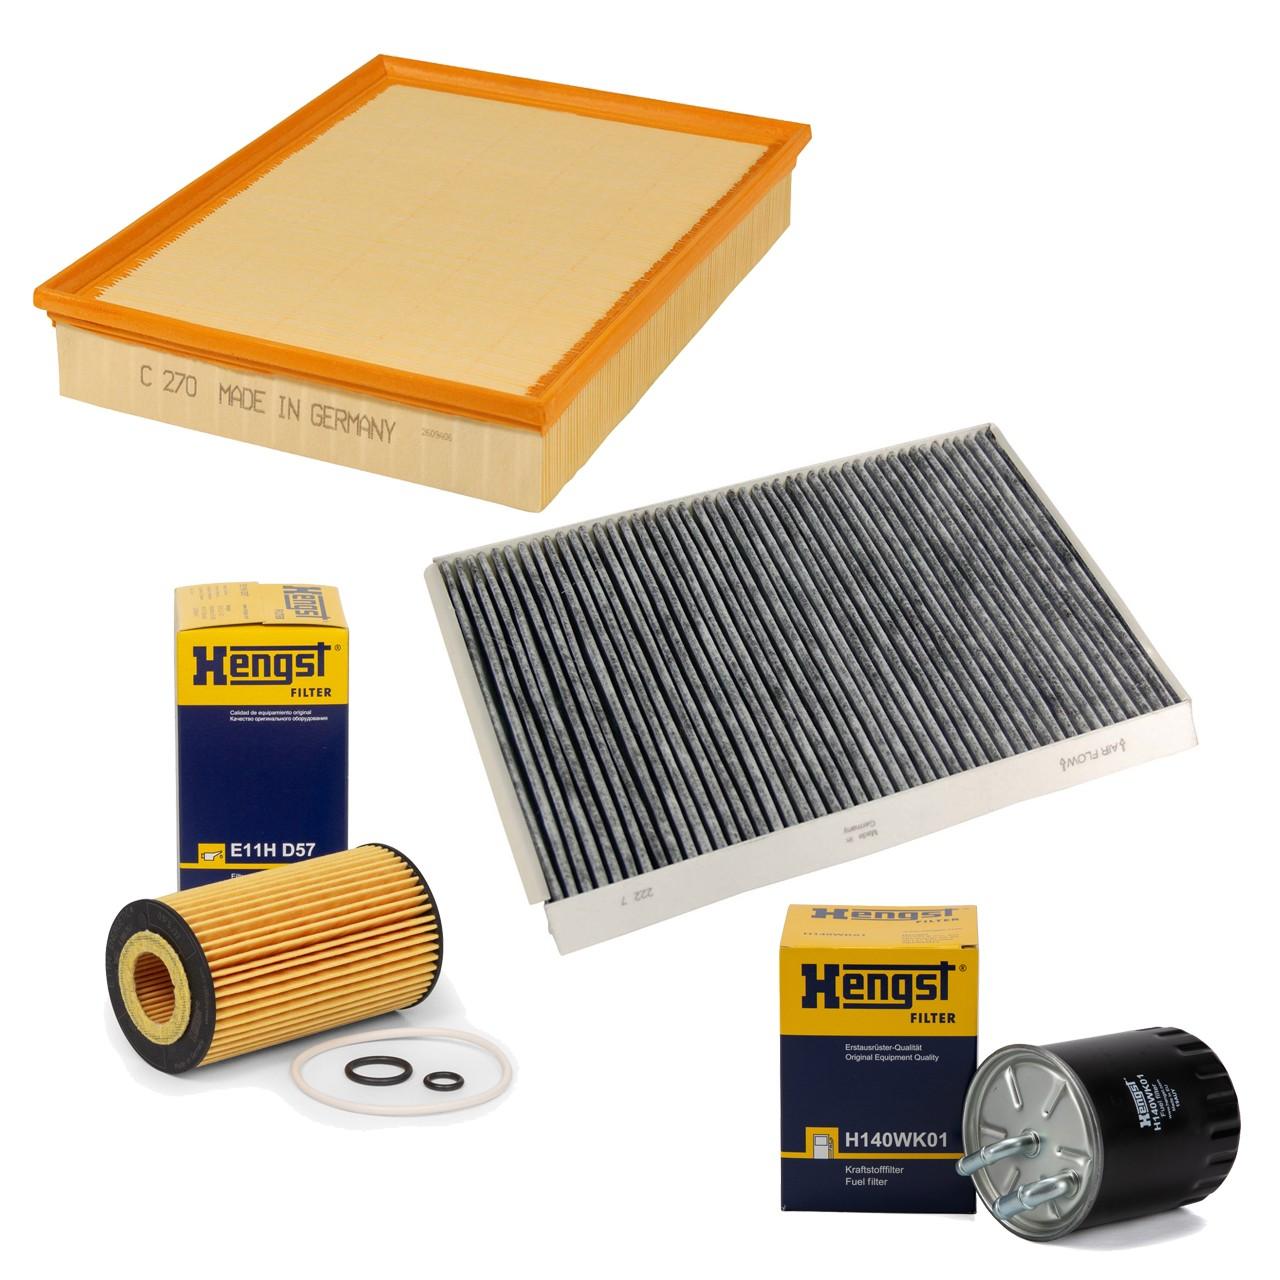 Inspektionskit MERCEDES-BENZ Sprinter 906 09/11/13/15CDI 88-150 PS OM646